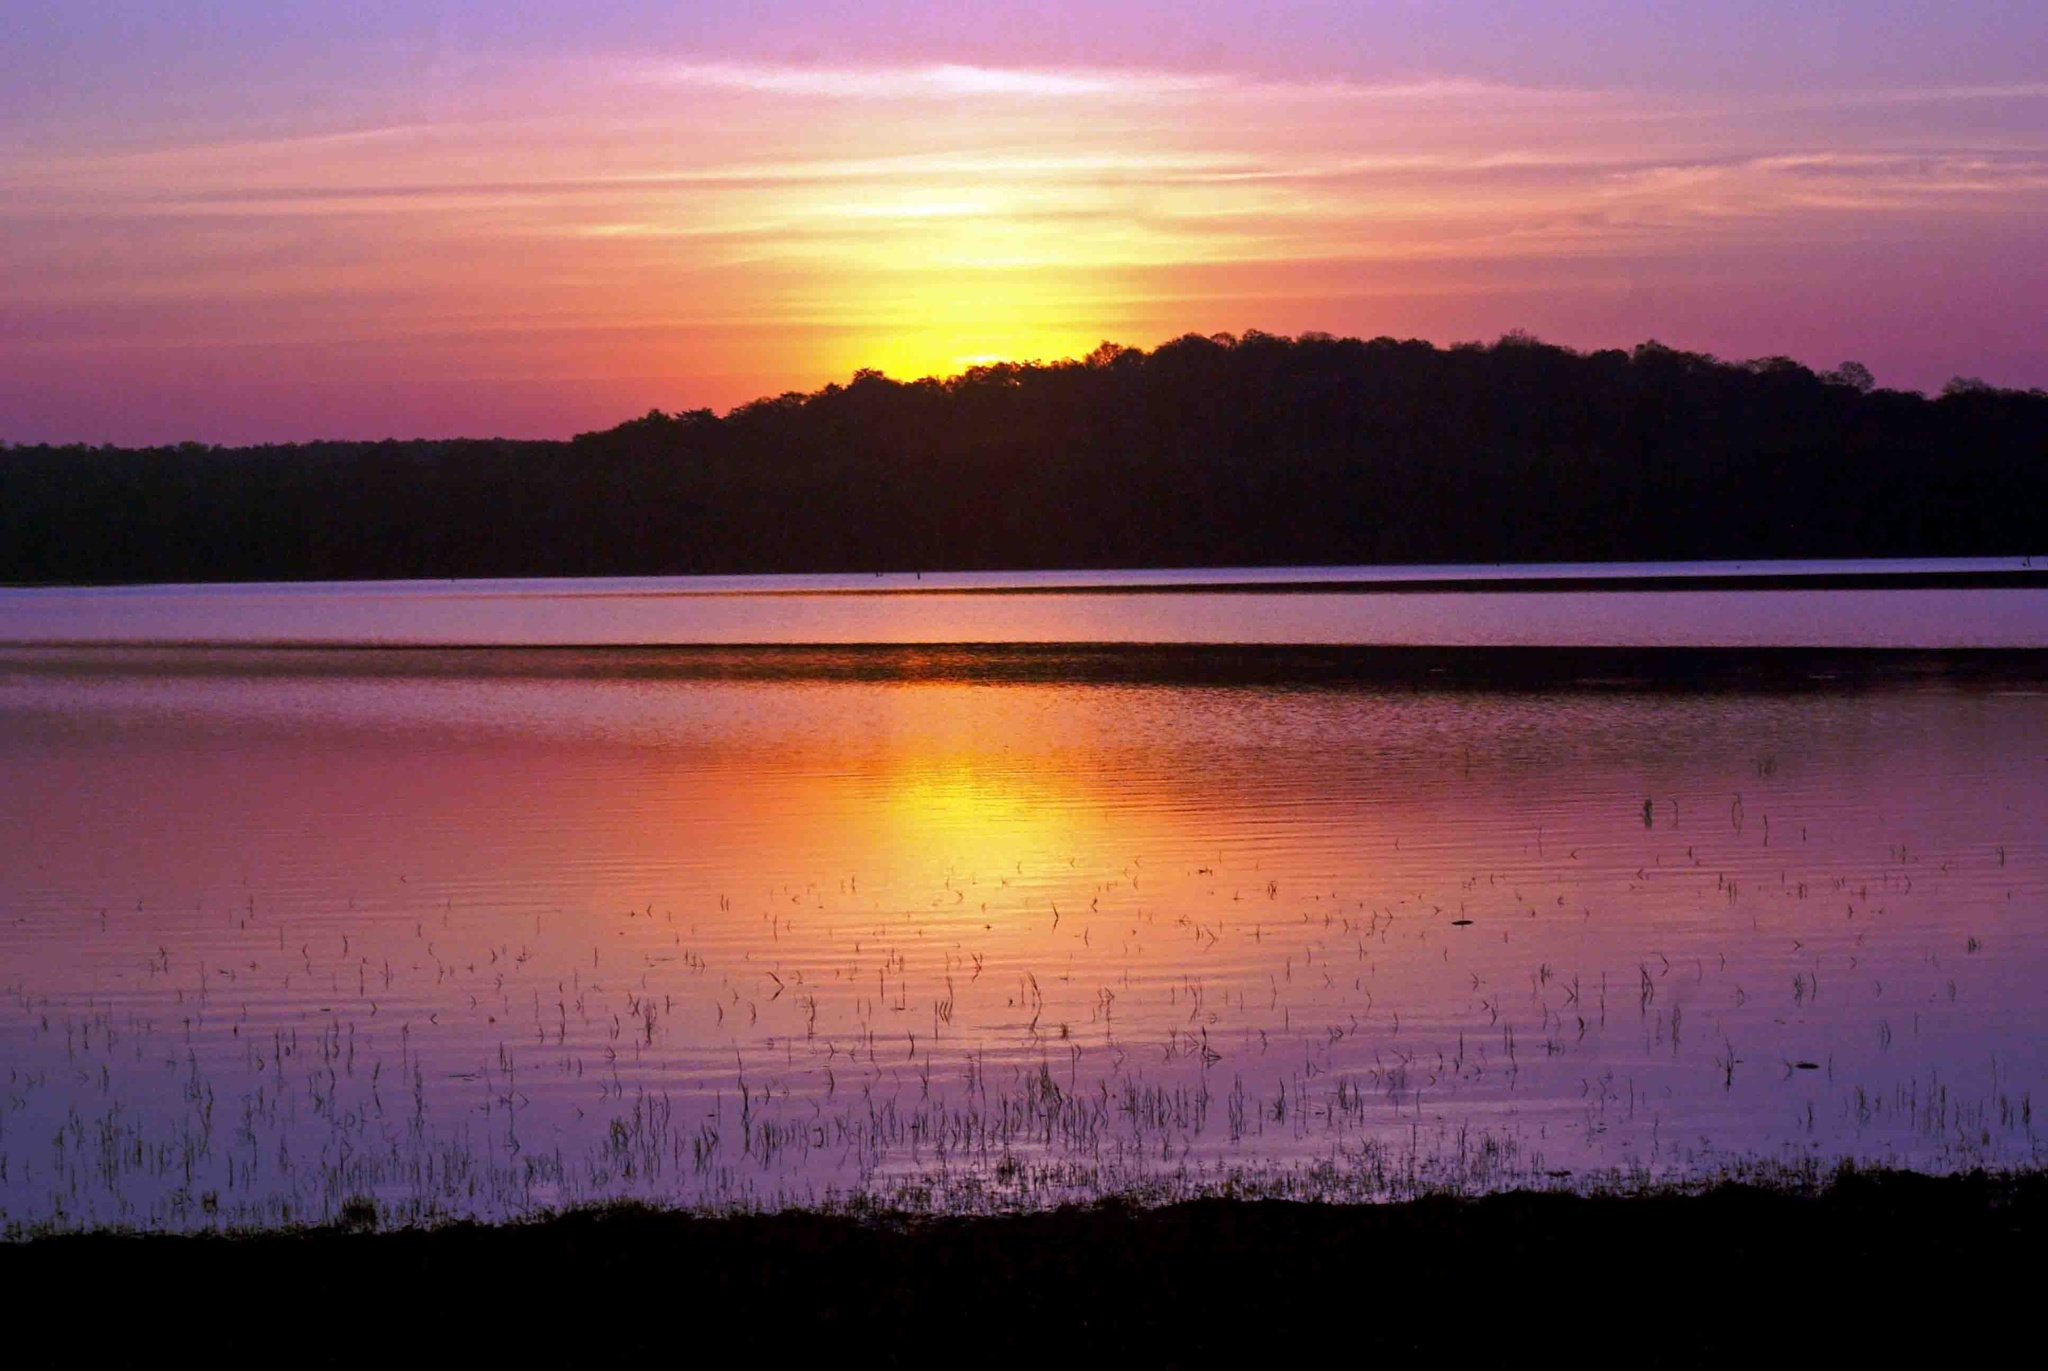 sunset - Kabini by guran60